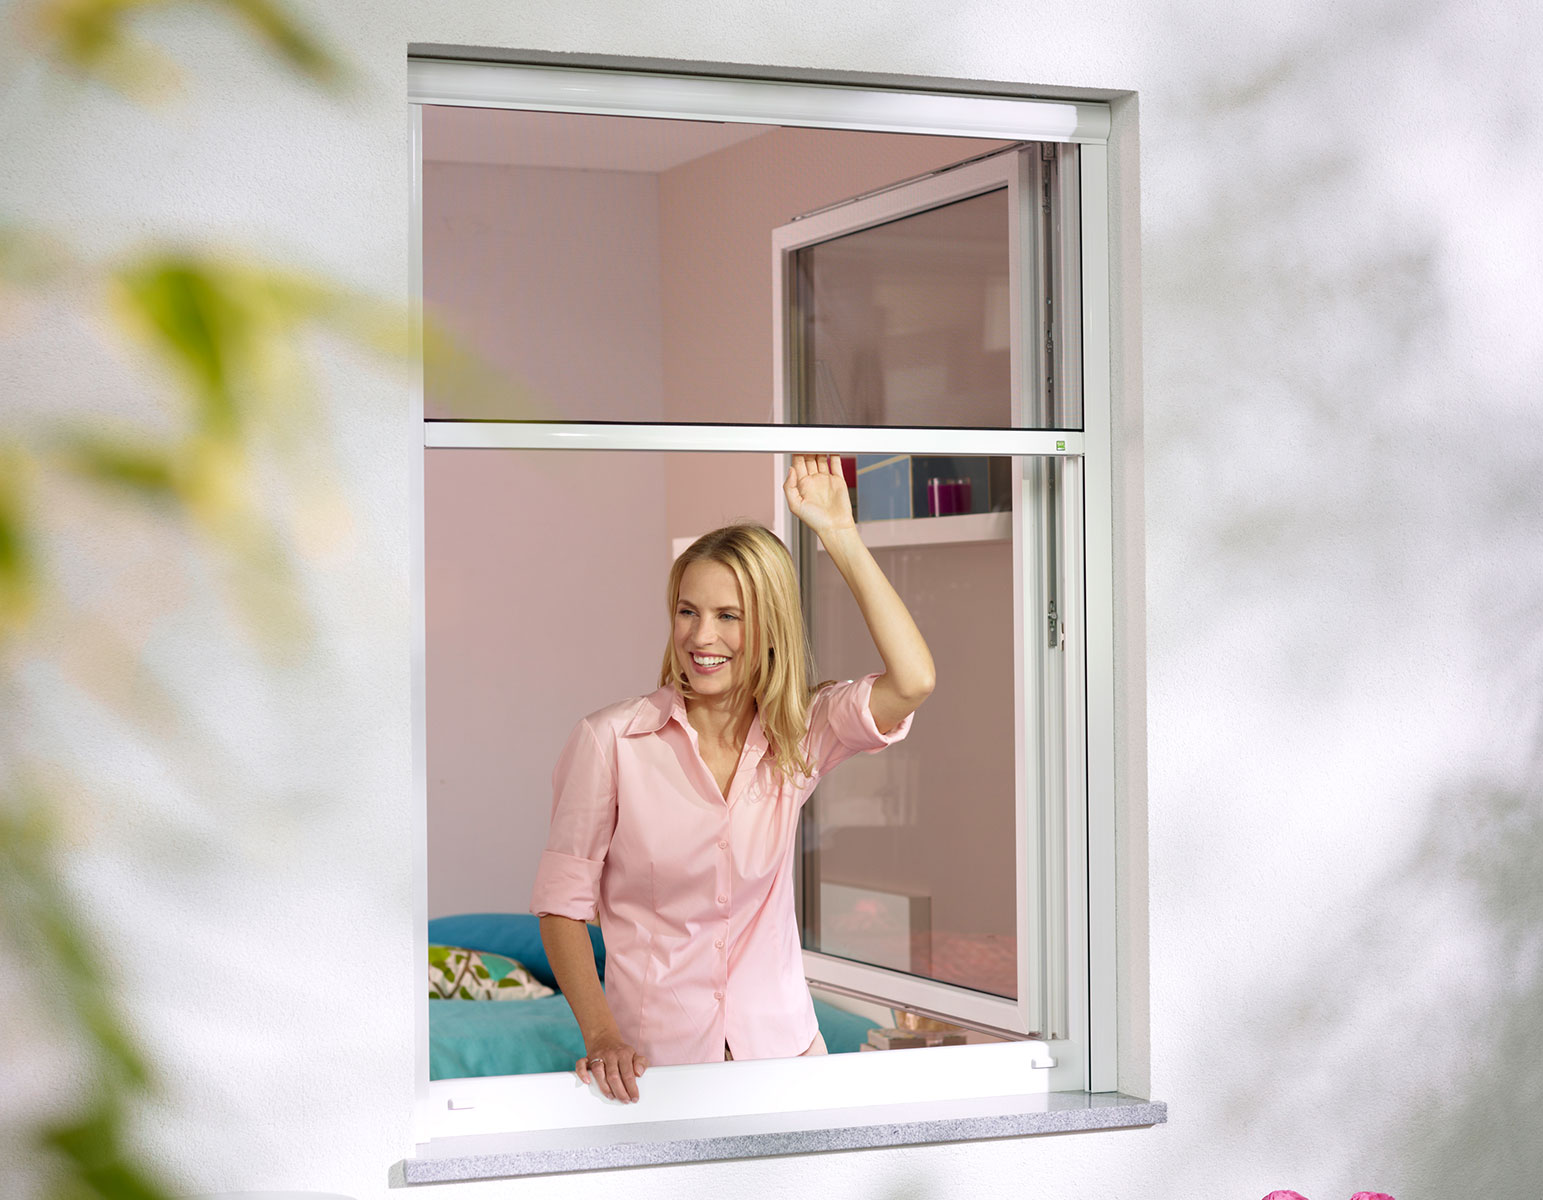 Fenster Scheibling - Insektenschutz - Rollos